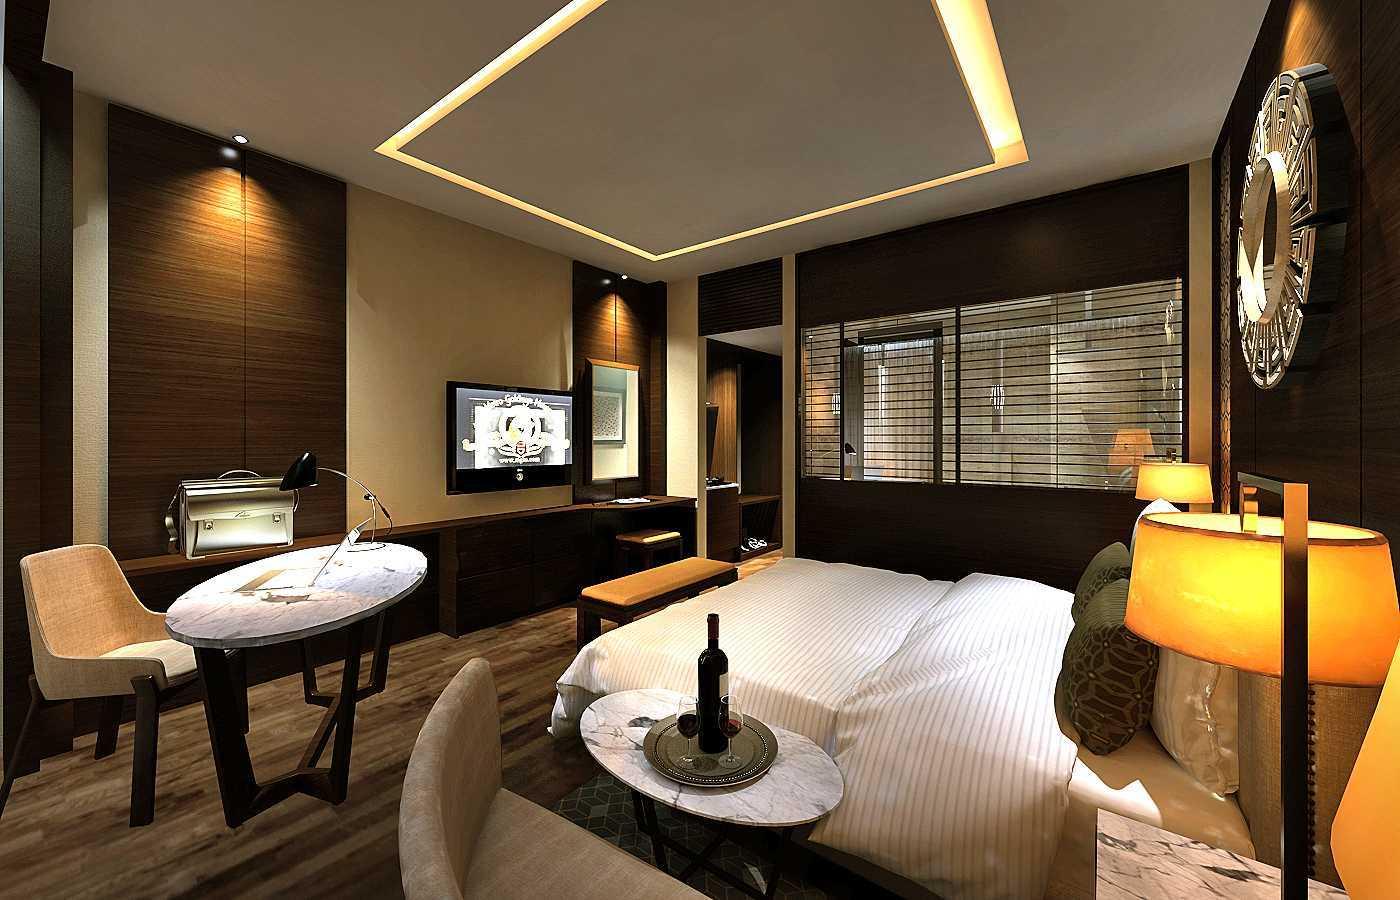 Rinto Katili Hotel Unit Surabaya Surabaya Hotel_Room Unit_View To Tv Area Kontemporer  24812